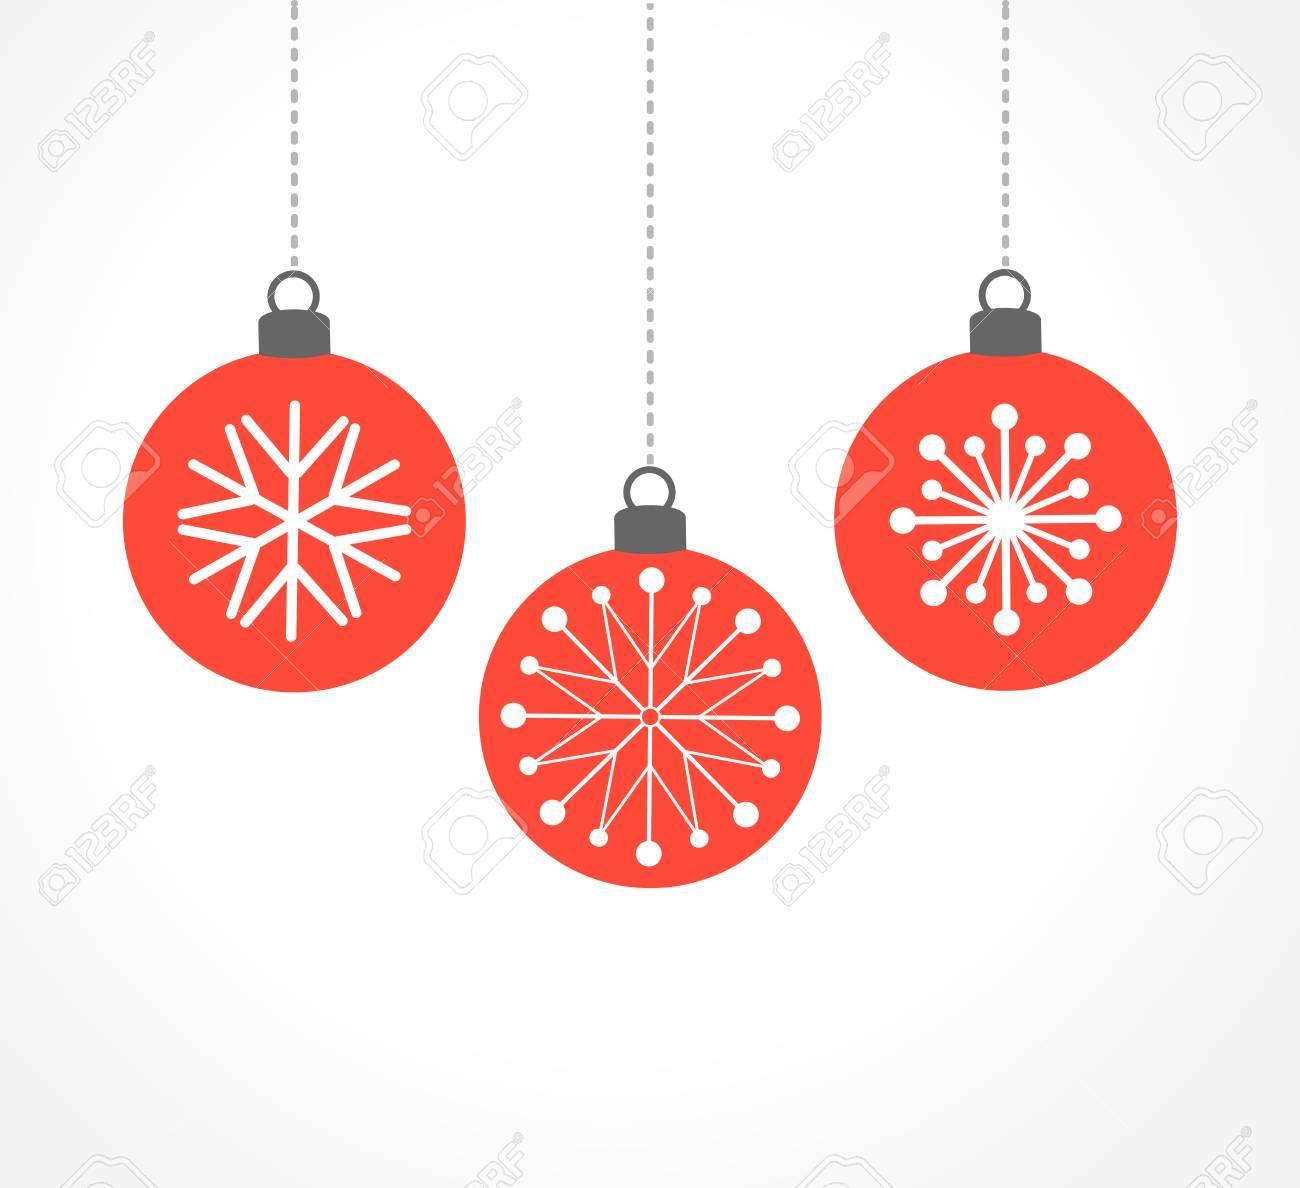 Christmas Ornament Vector.Red Christmas Balls Ornaments Vector Illustration